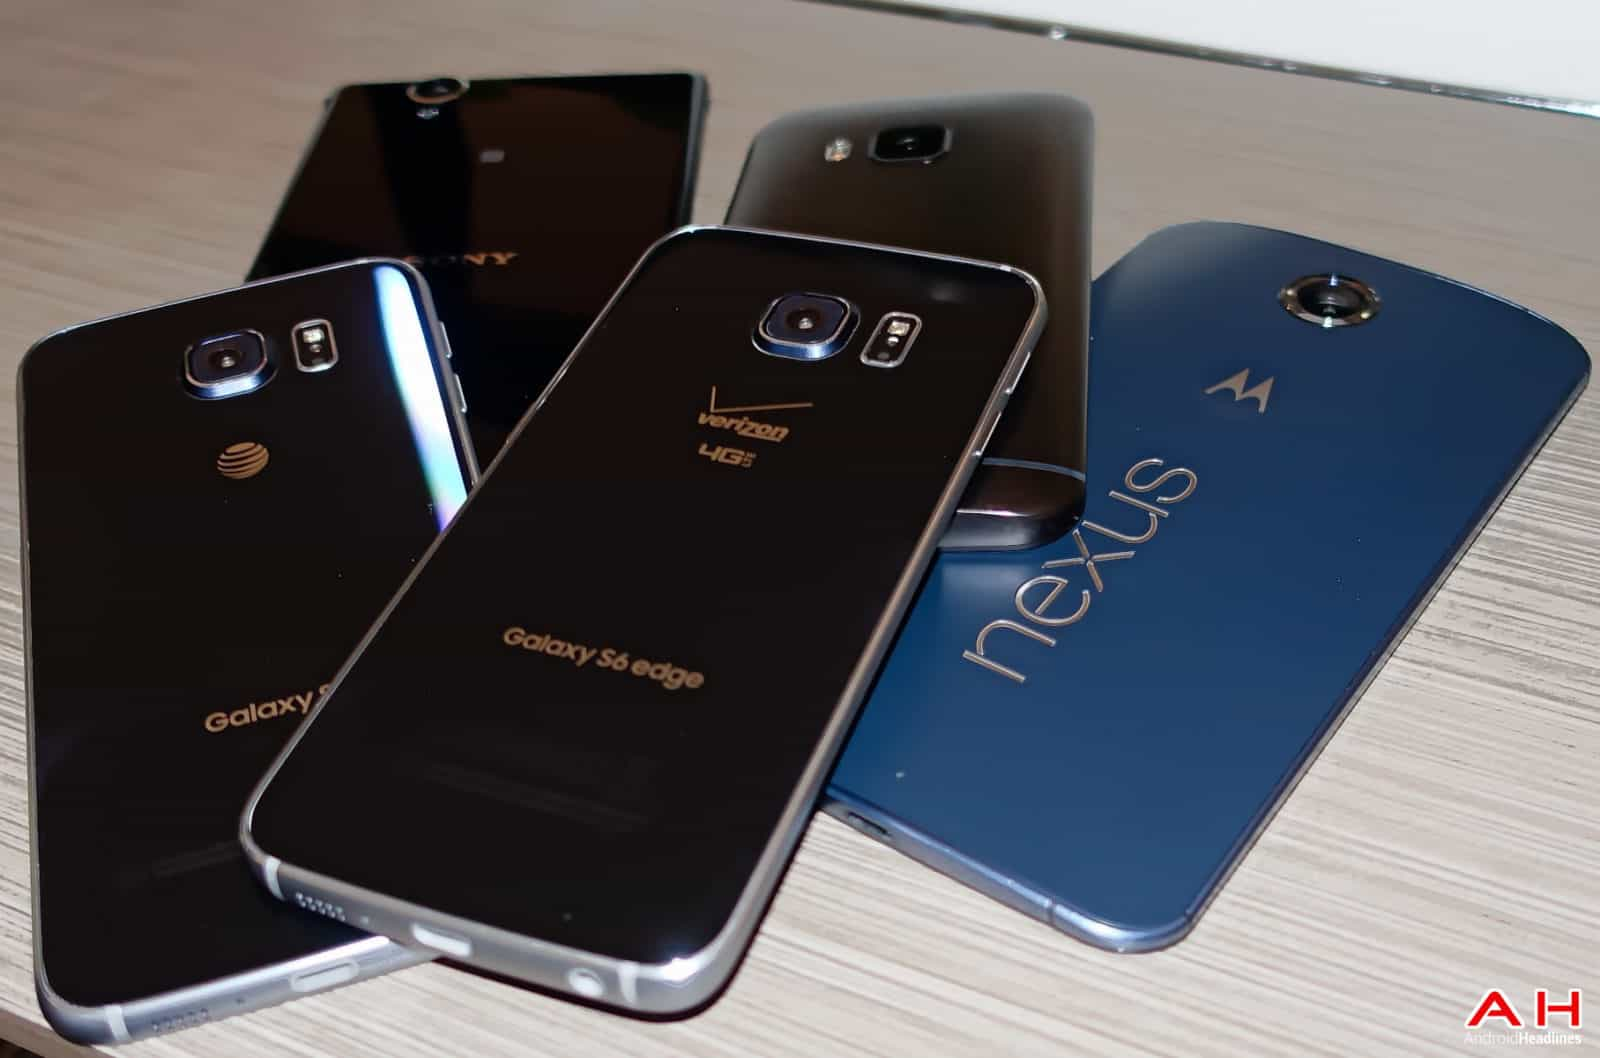 AH Android Samrtphones Nexus Samsung Galaxy S6 HTC One M9 Sony OEM logos-18